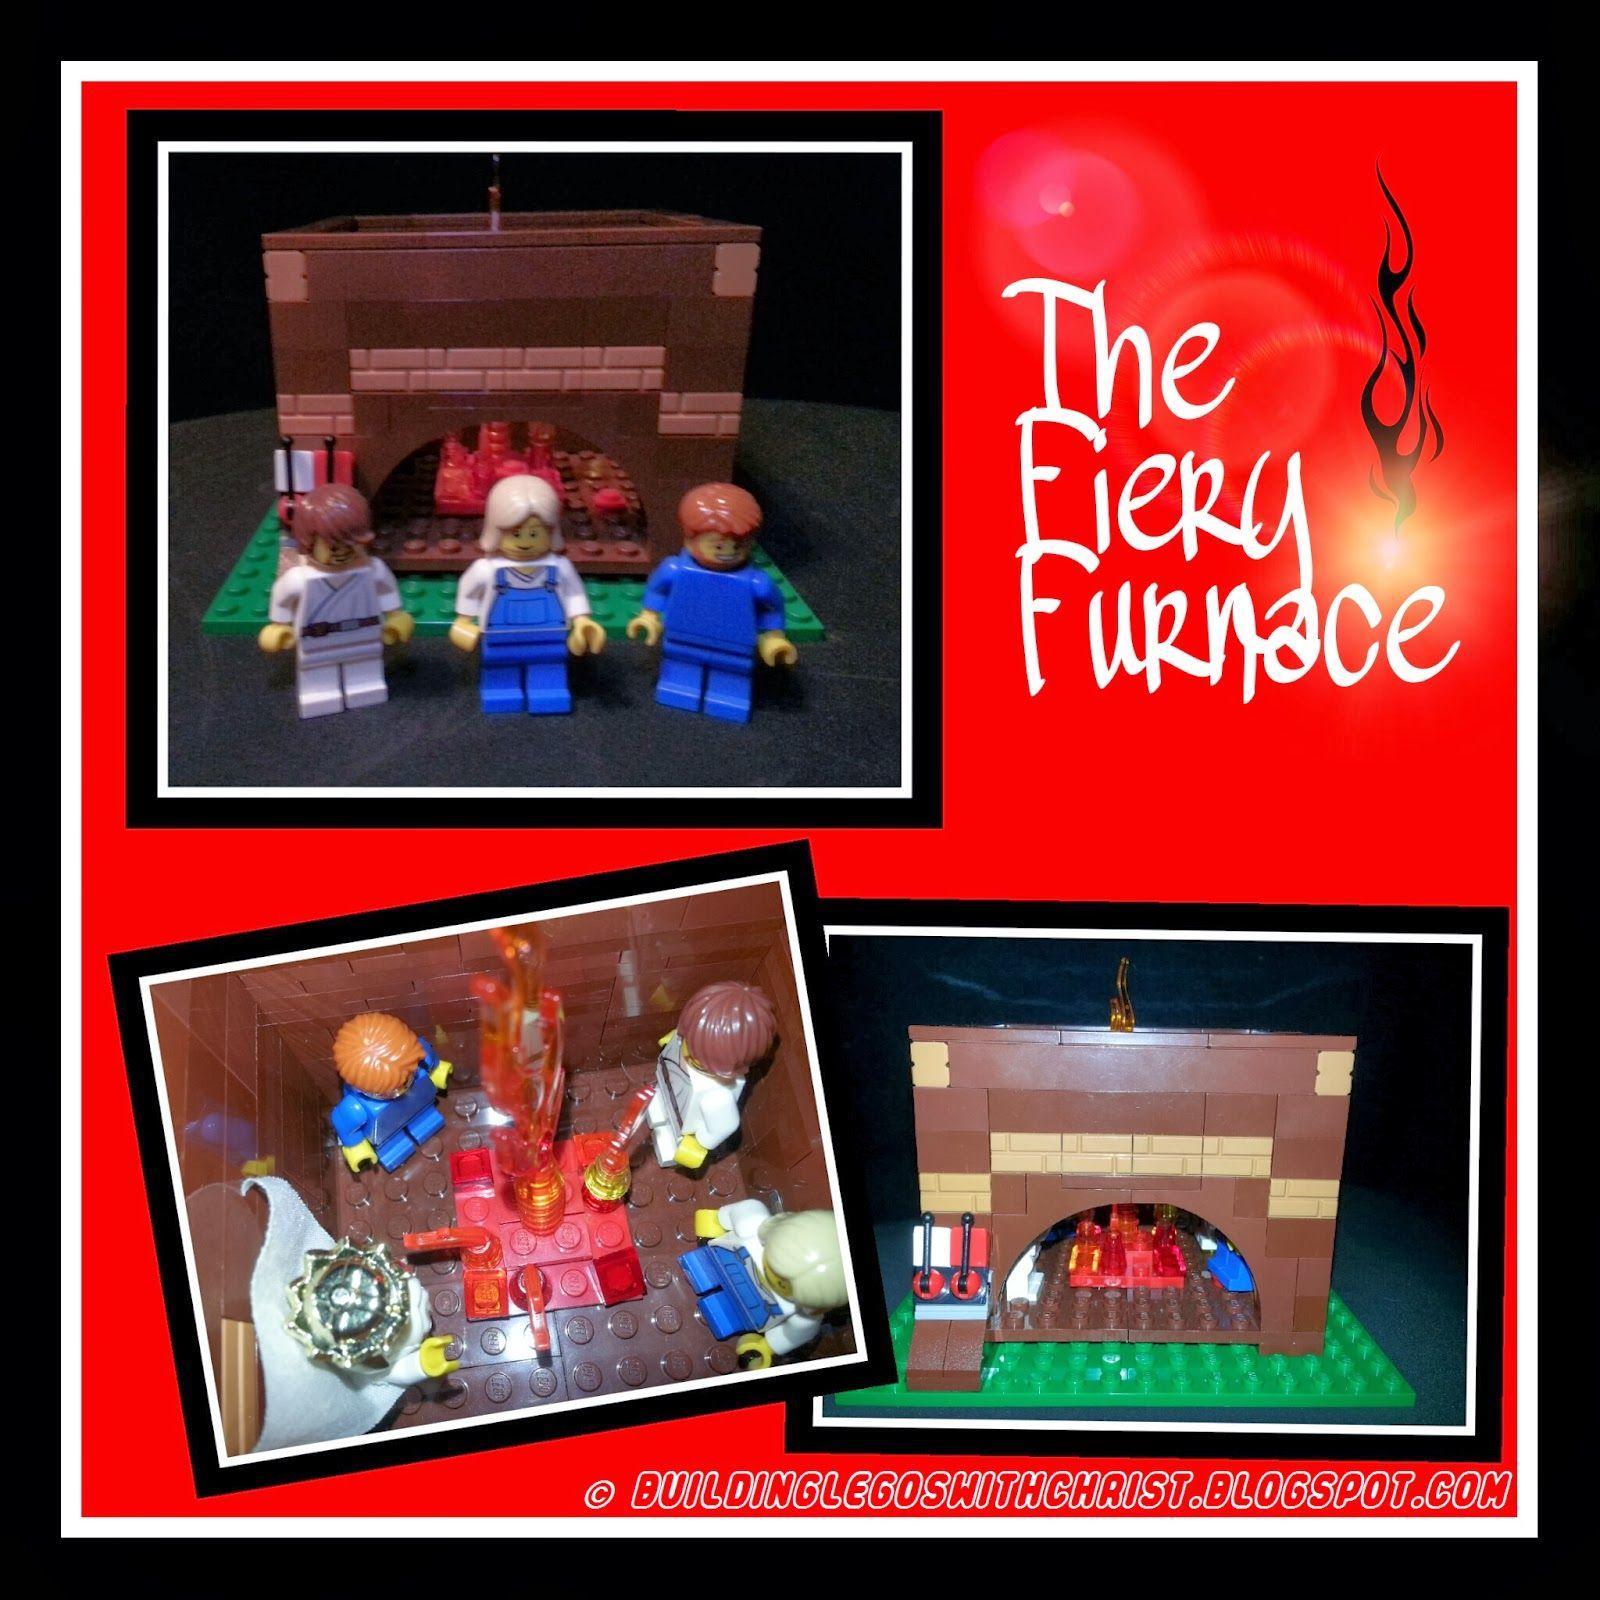 biblical lego creation of shadrach meshach abednego kids